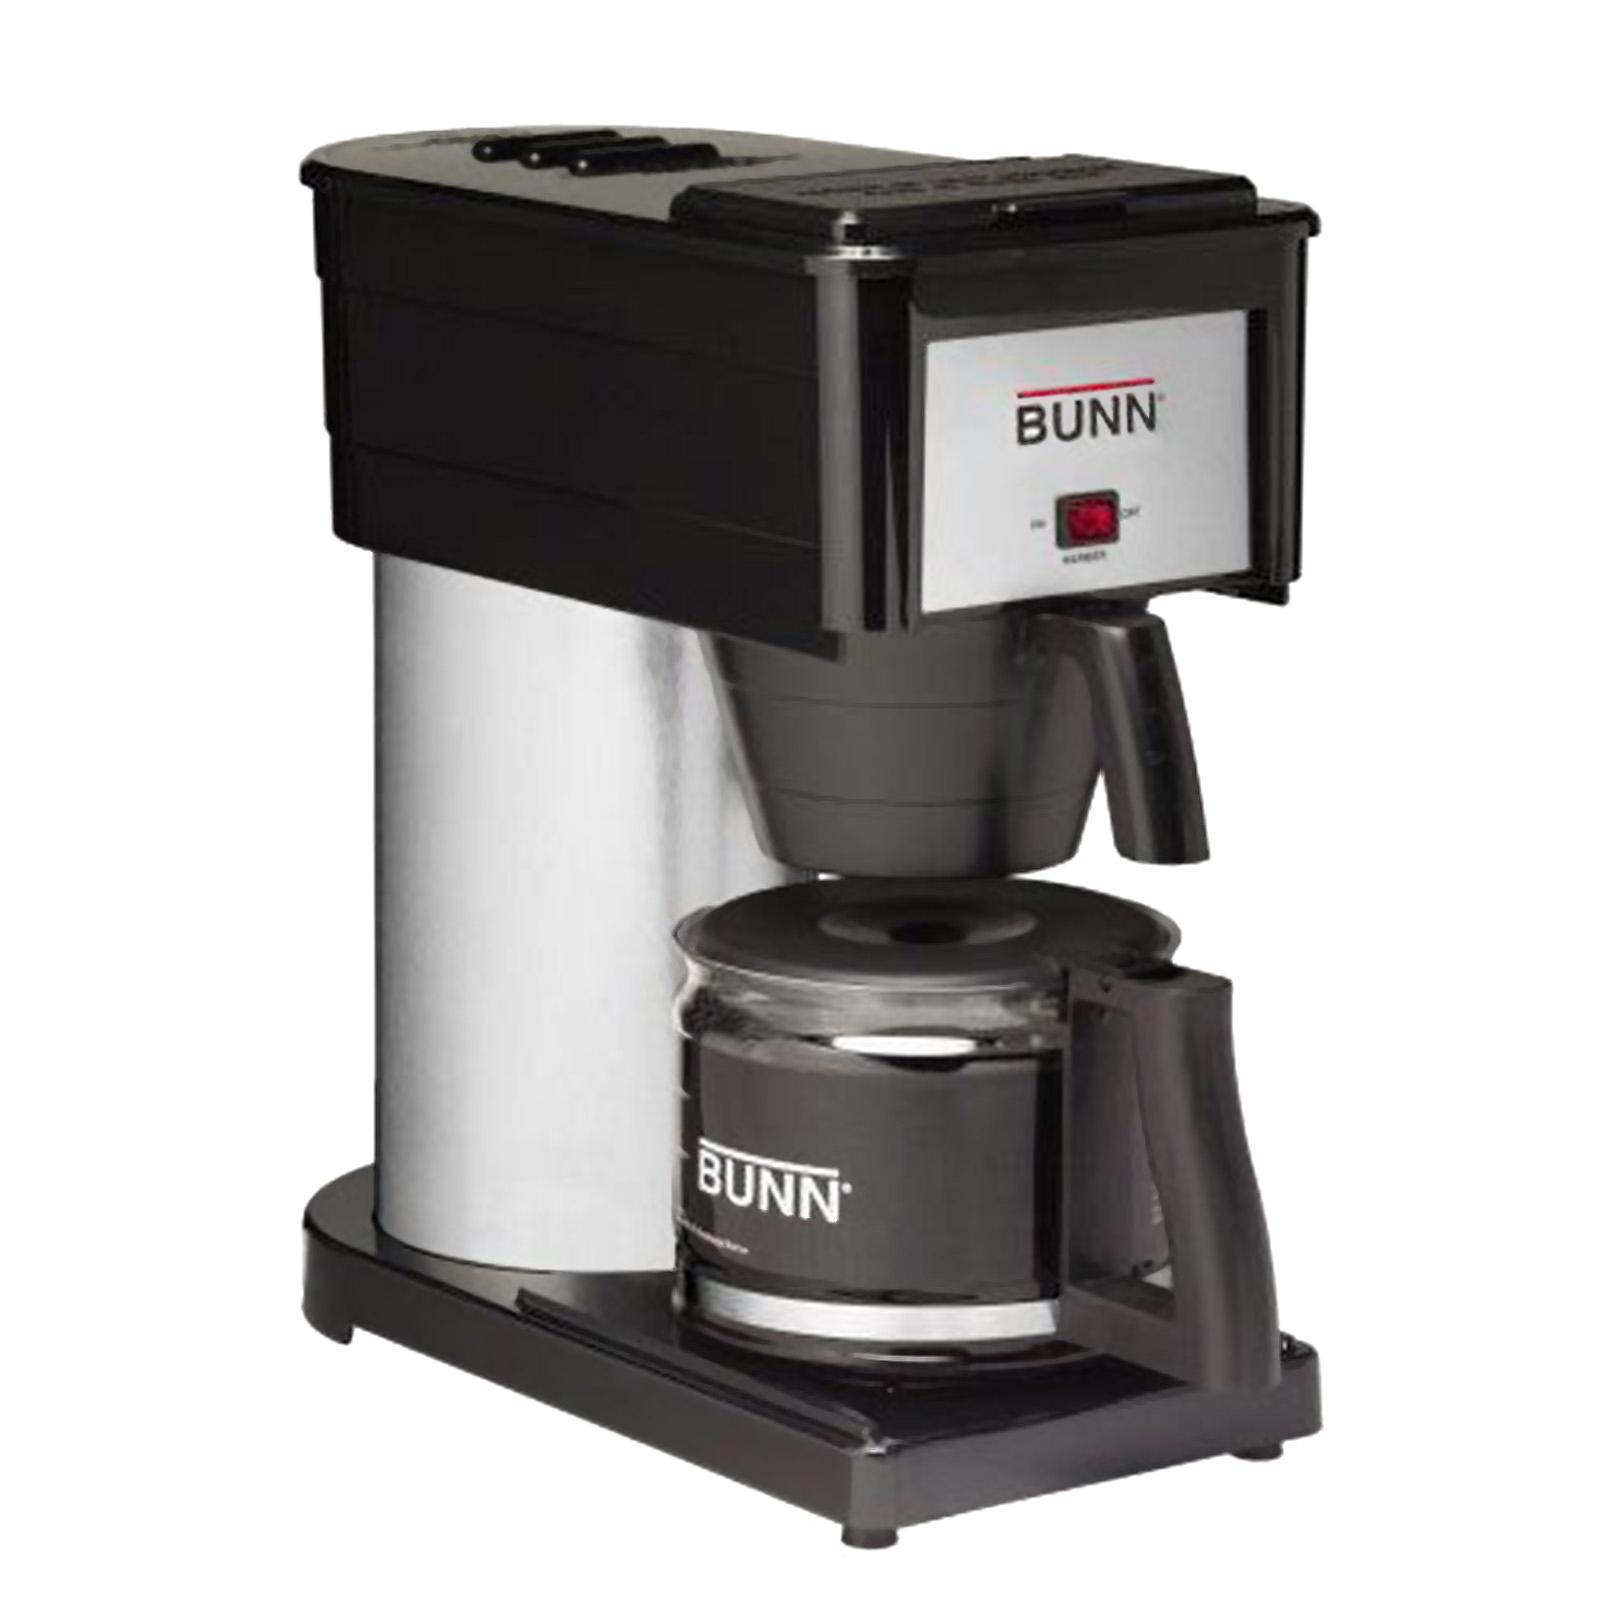 Bunn 10-Cup Classic Home Coffee Brewer - Black